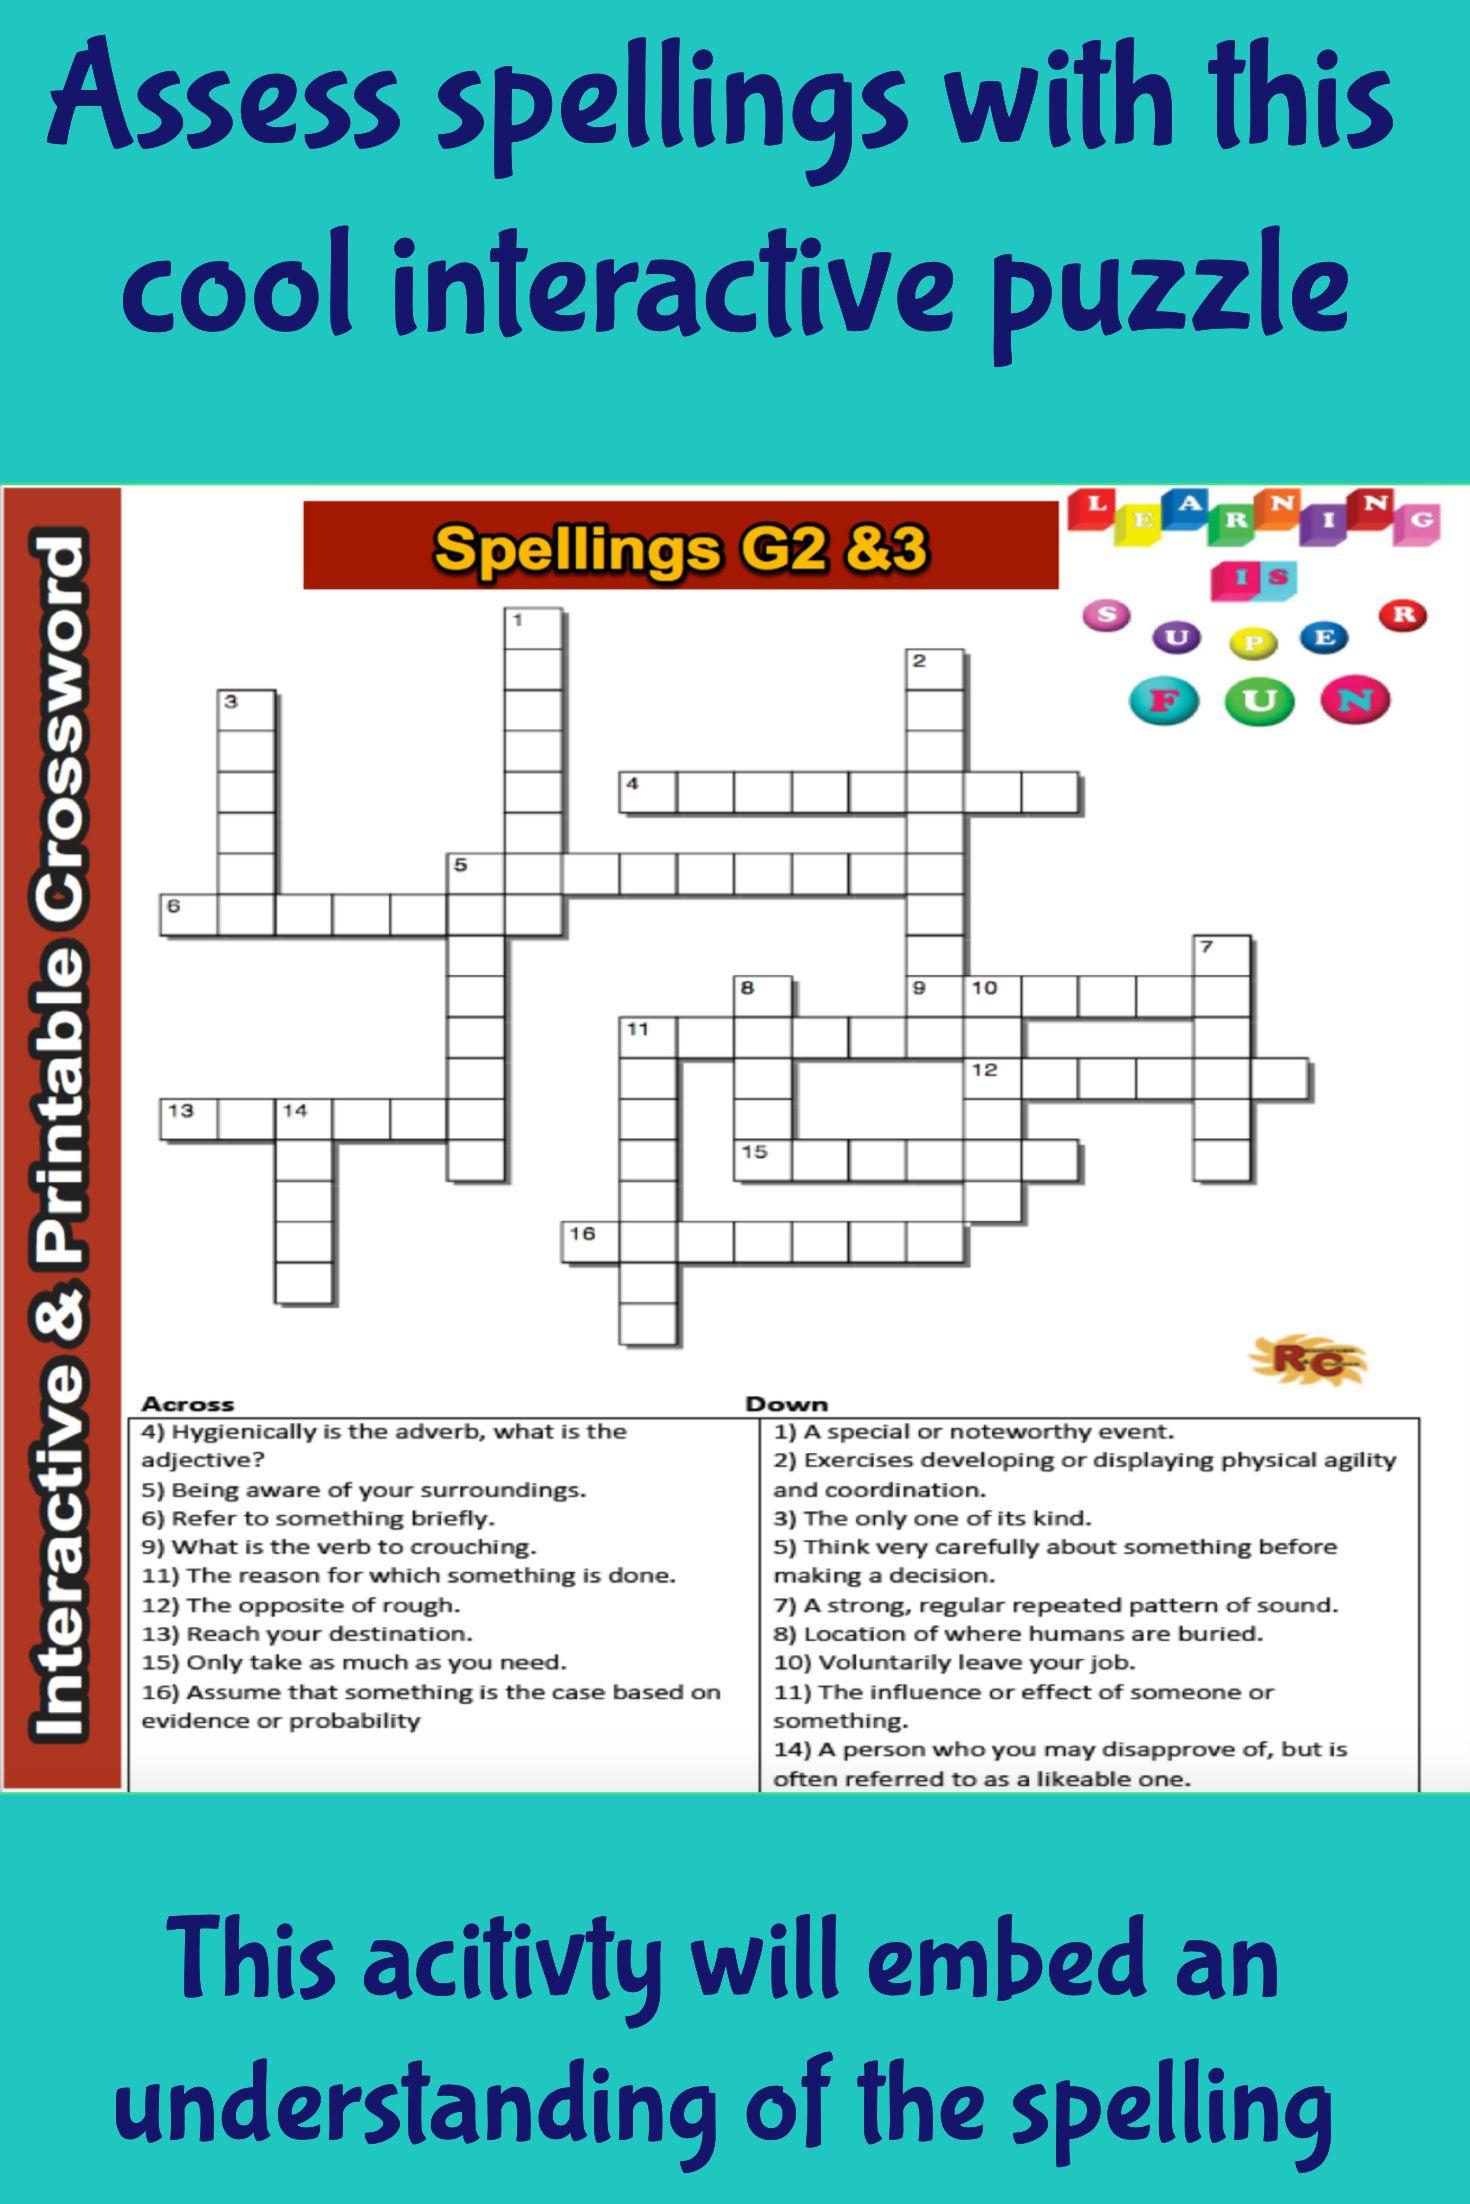 Spelling Grade 2&3 Interactive & Printable Crossword Puzzle | Word - Printable Crossword Puzzles Business And Finance